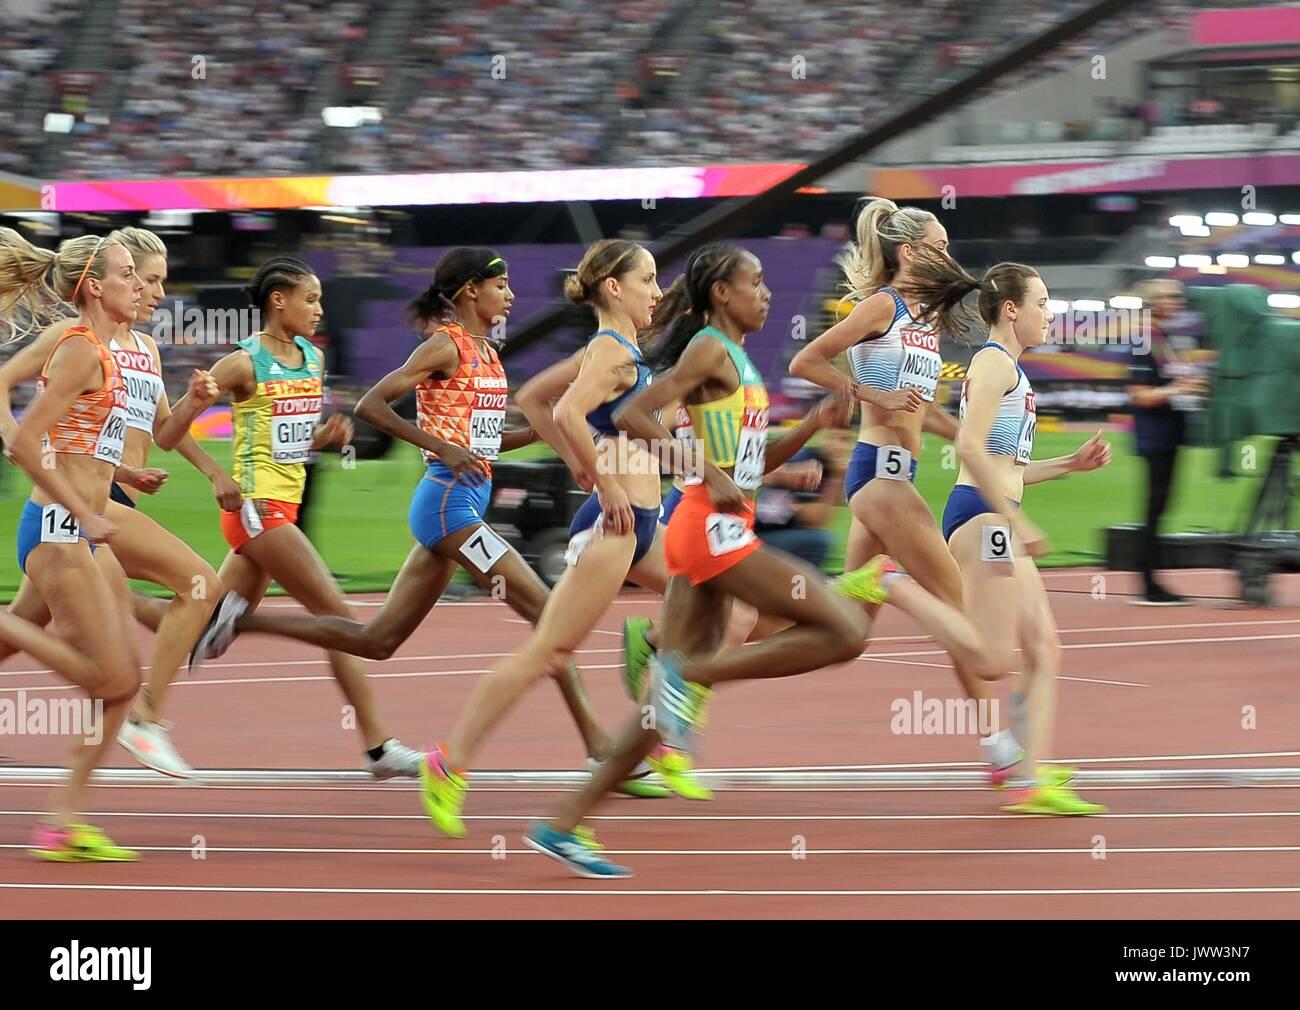 London, UK. 13th Aug, 2017. Eilish MCCOLGAN (GBR) and Laura MUIR (GBR) in the womens 5000m final. IAAF world athletics Stock Photo